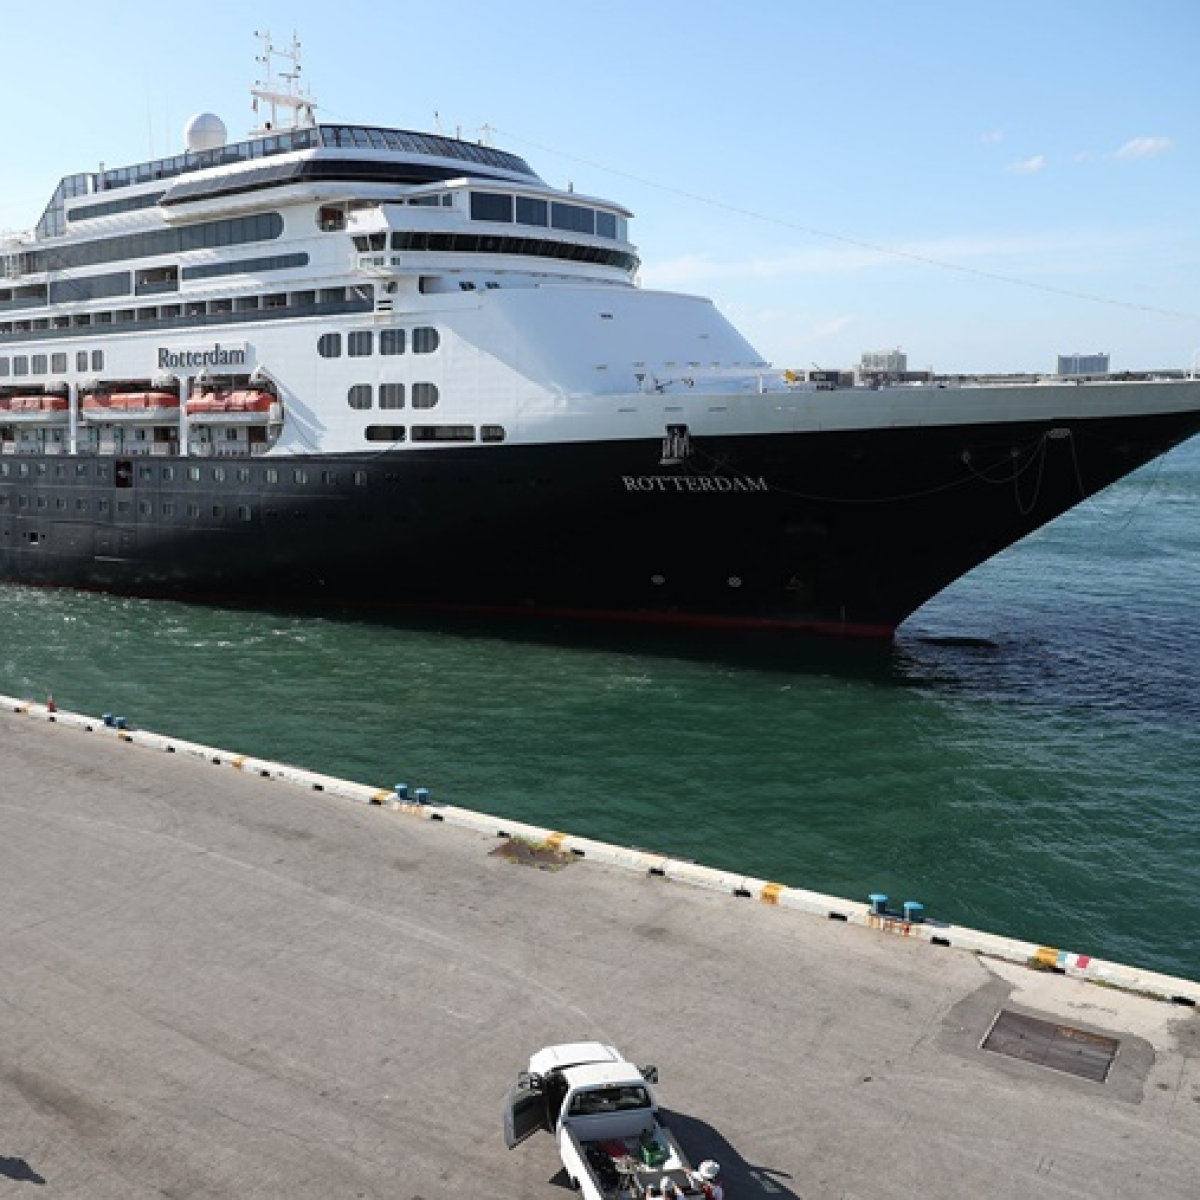 Coronavirus-stricken cruise ships allowed to dock in Florida